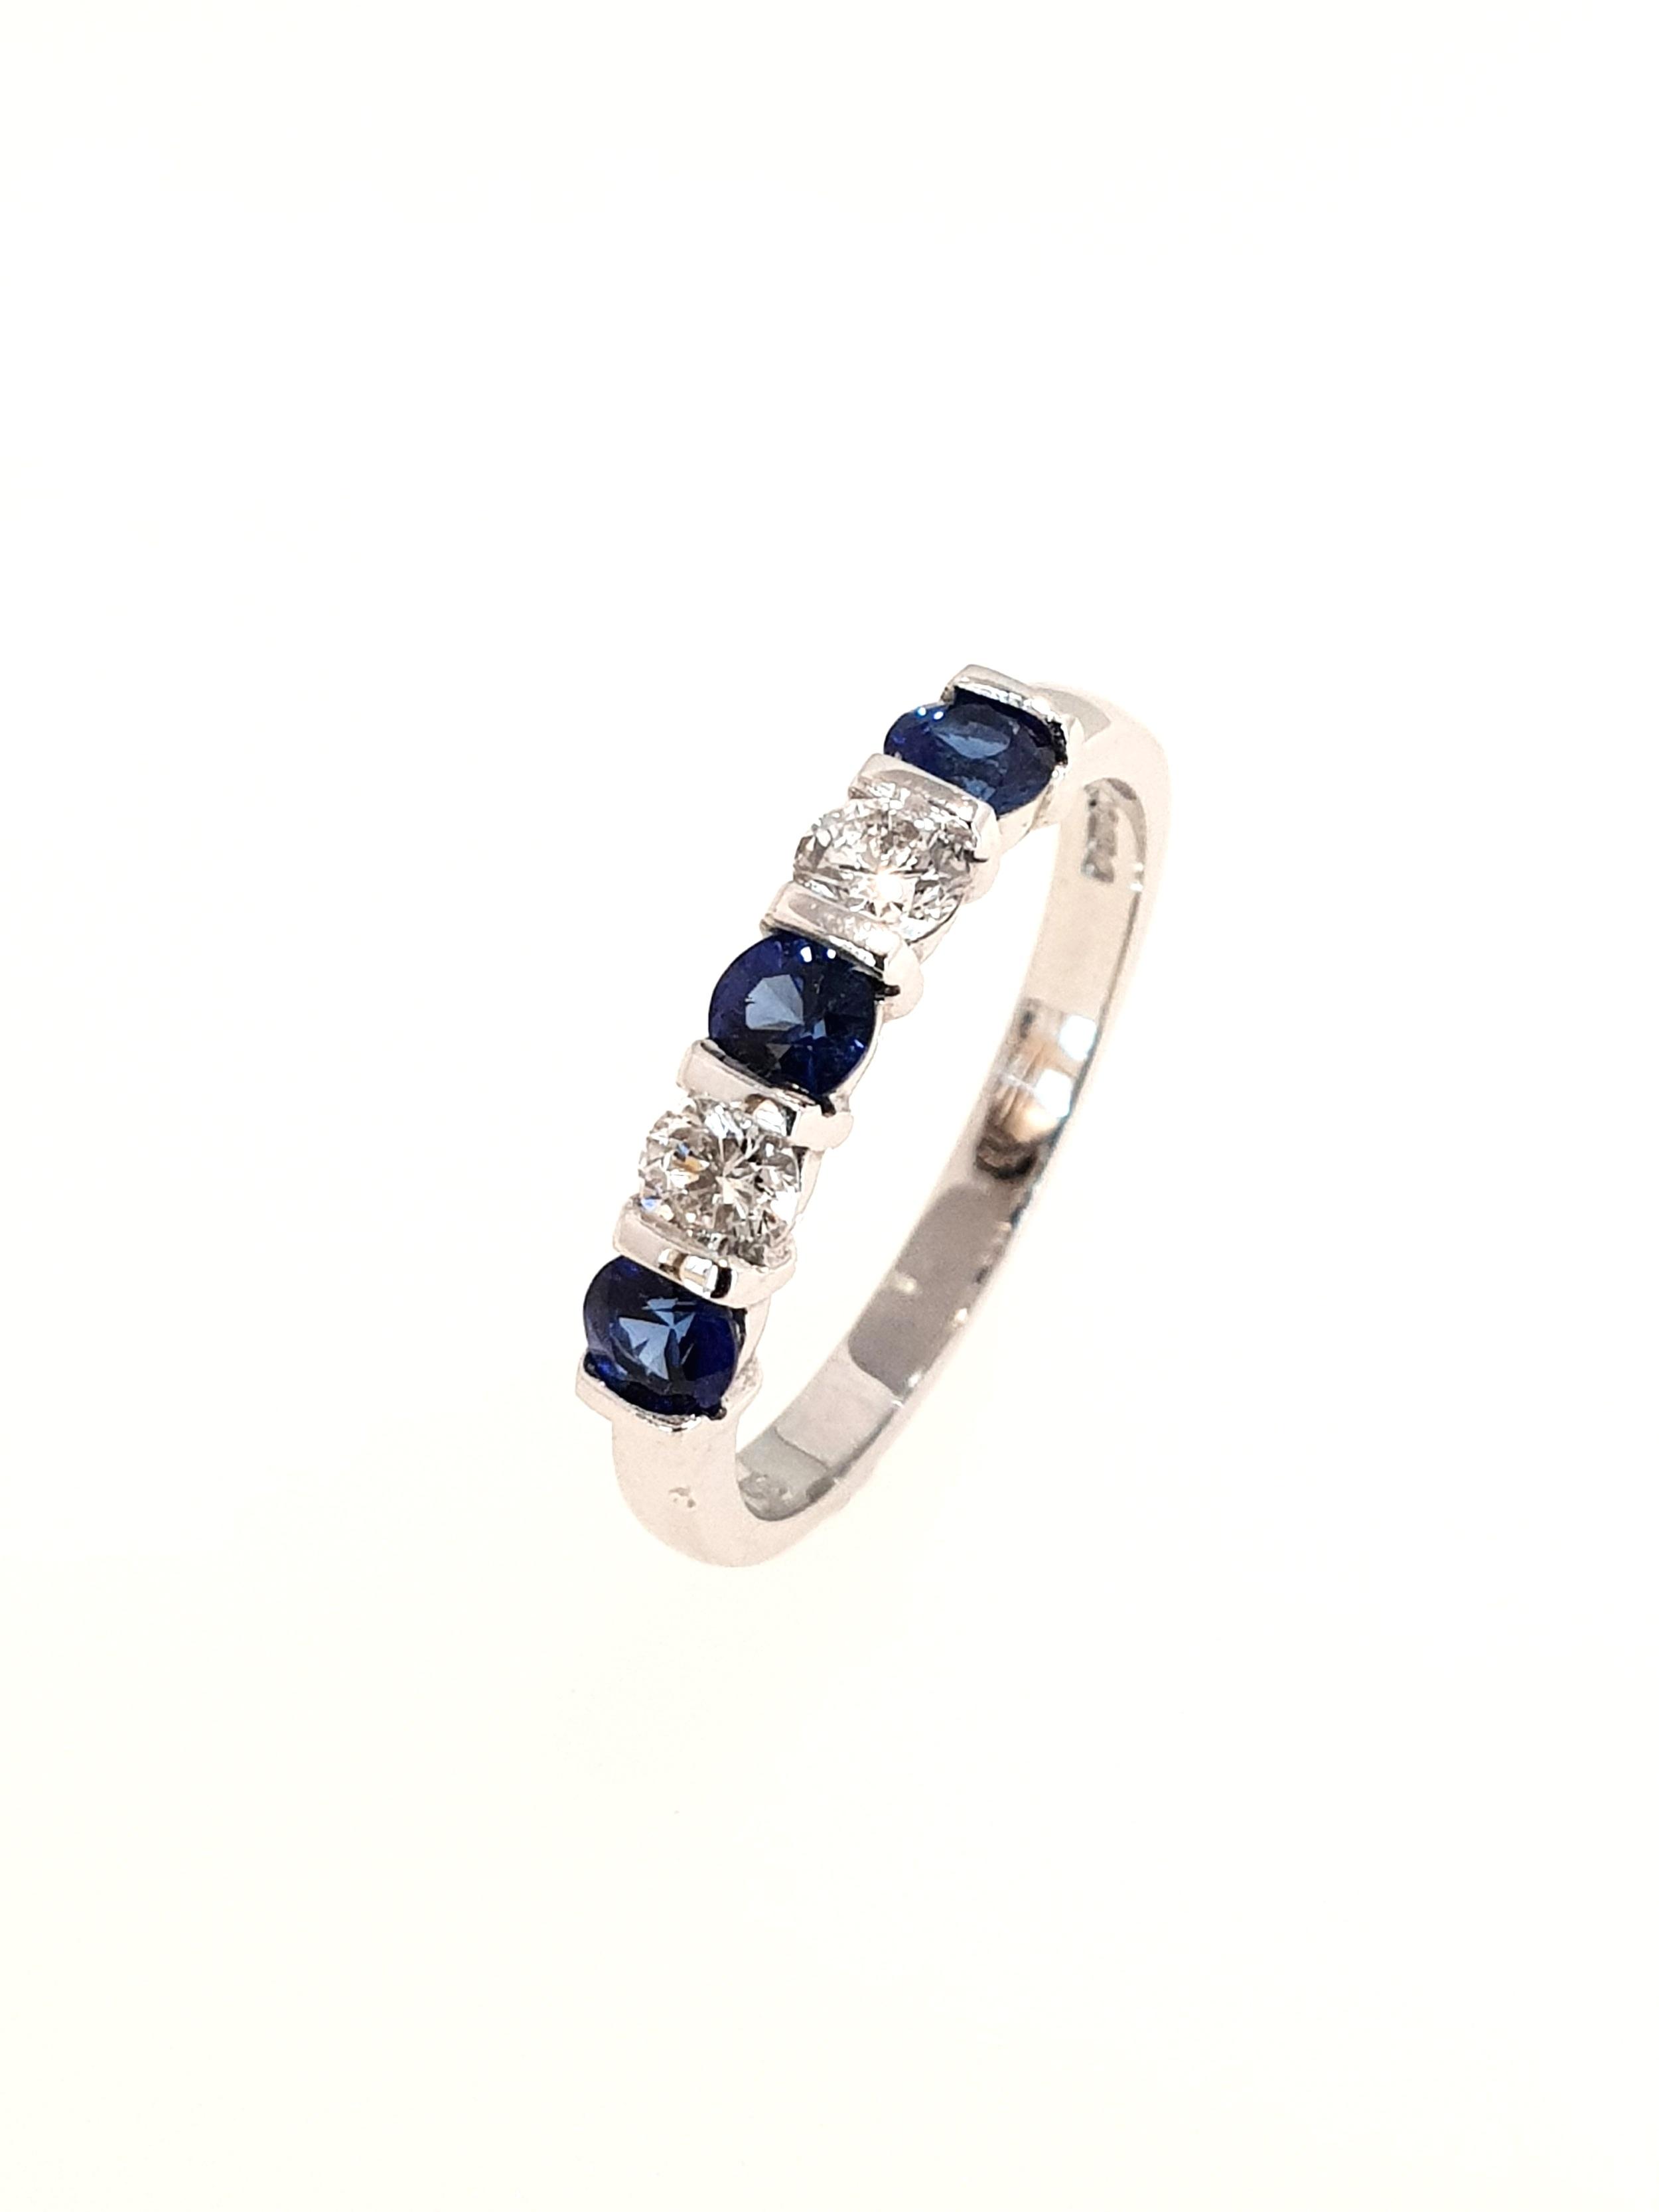 18ct White Gold Sapphire & Diamond Ring  .30ct, G, SI1 (Dia) & .55ct (Saph)  Stock Code: N8526  £1575